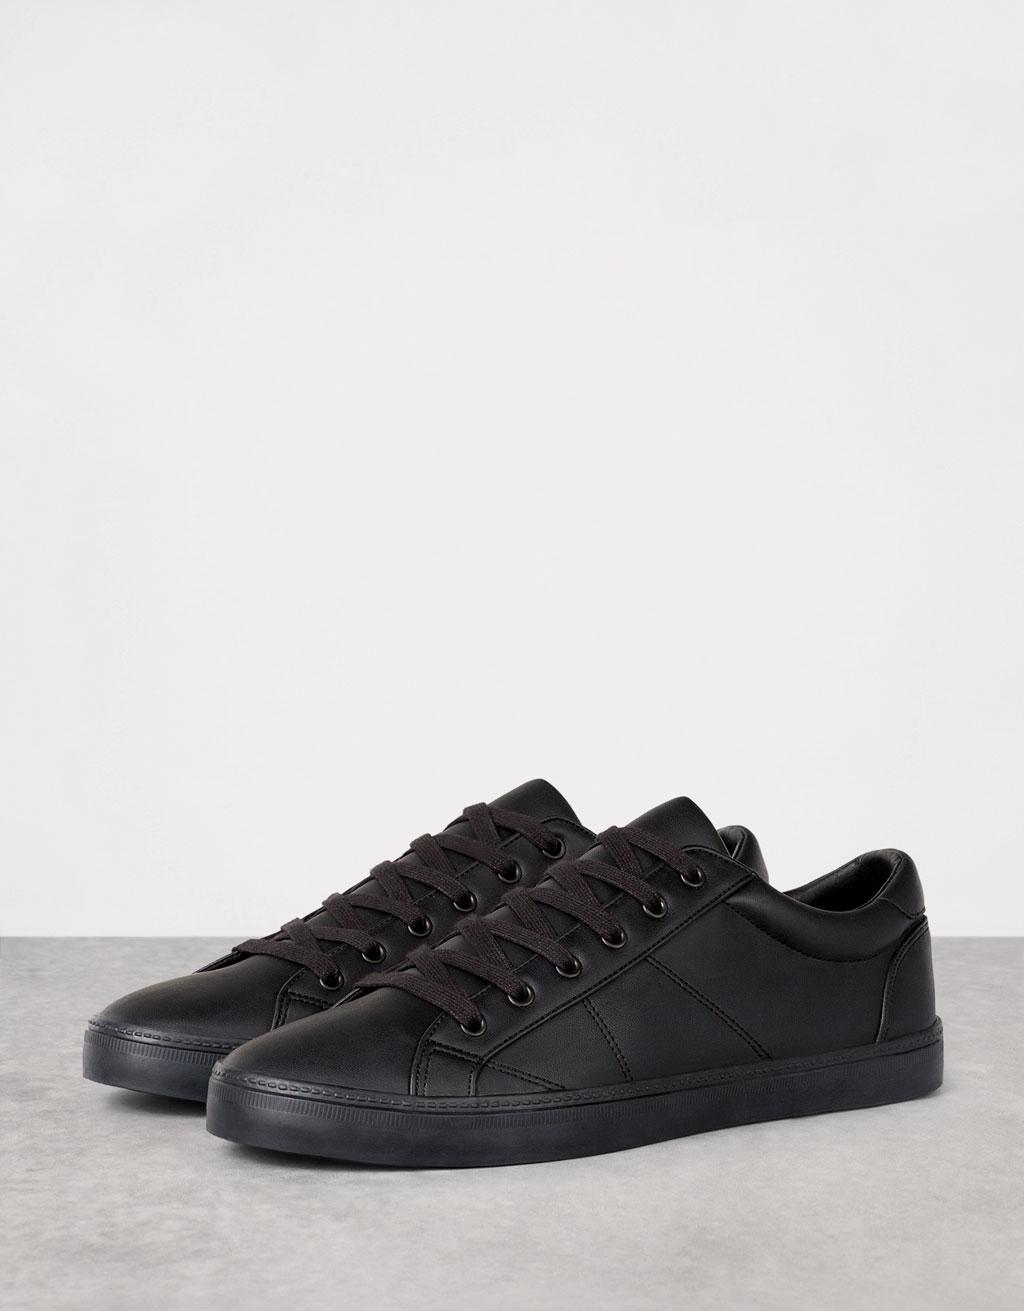 Basic Lace Up Brogue Shoes Men Bershka